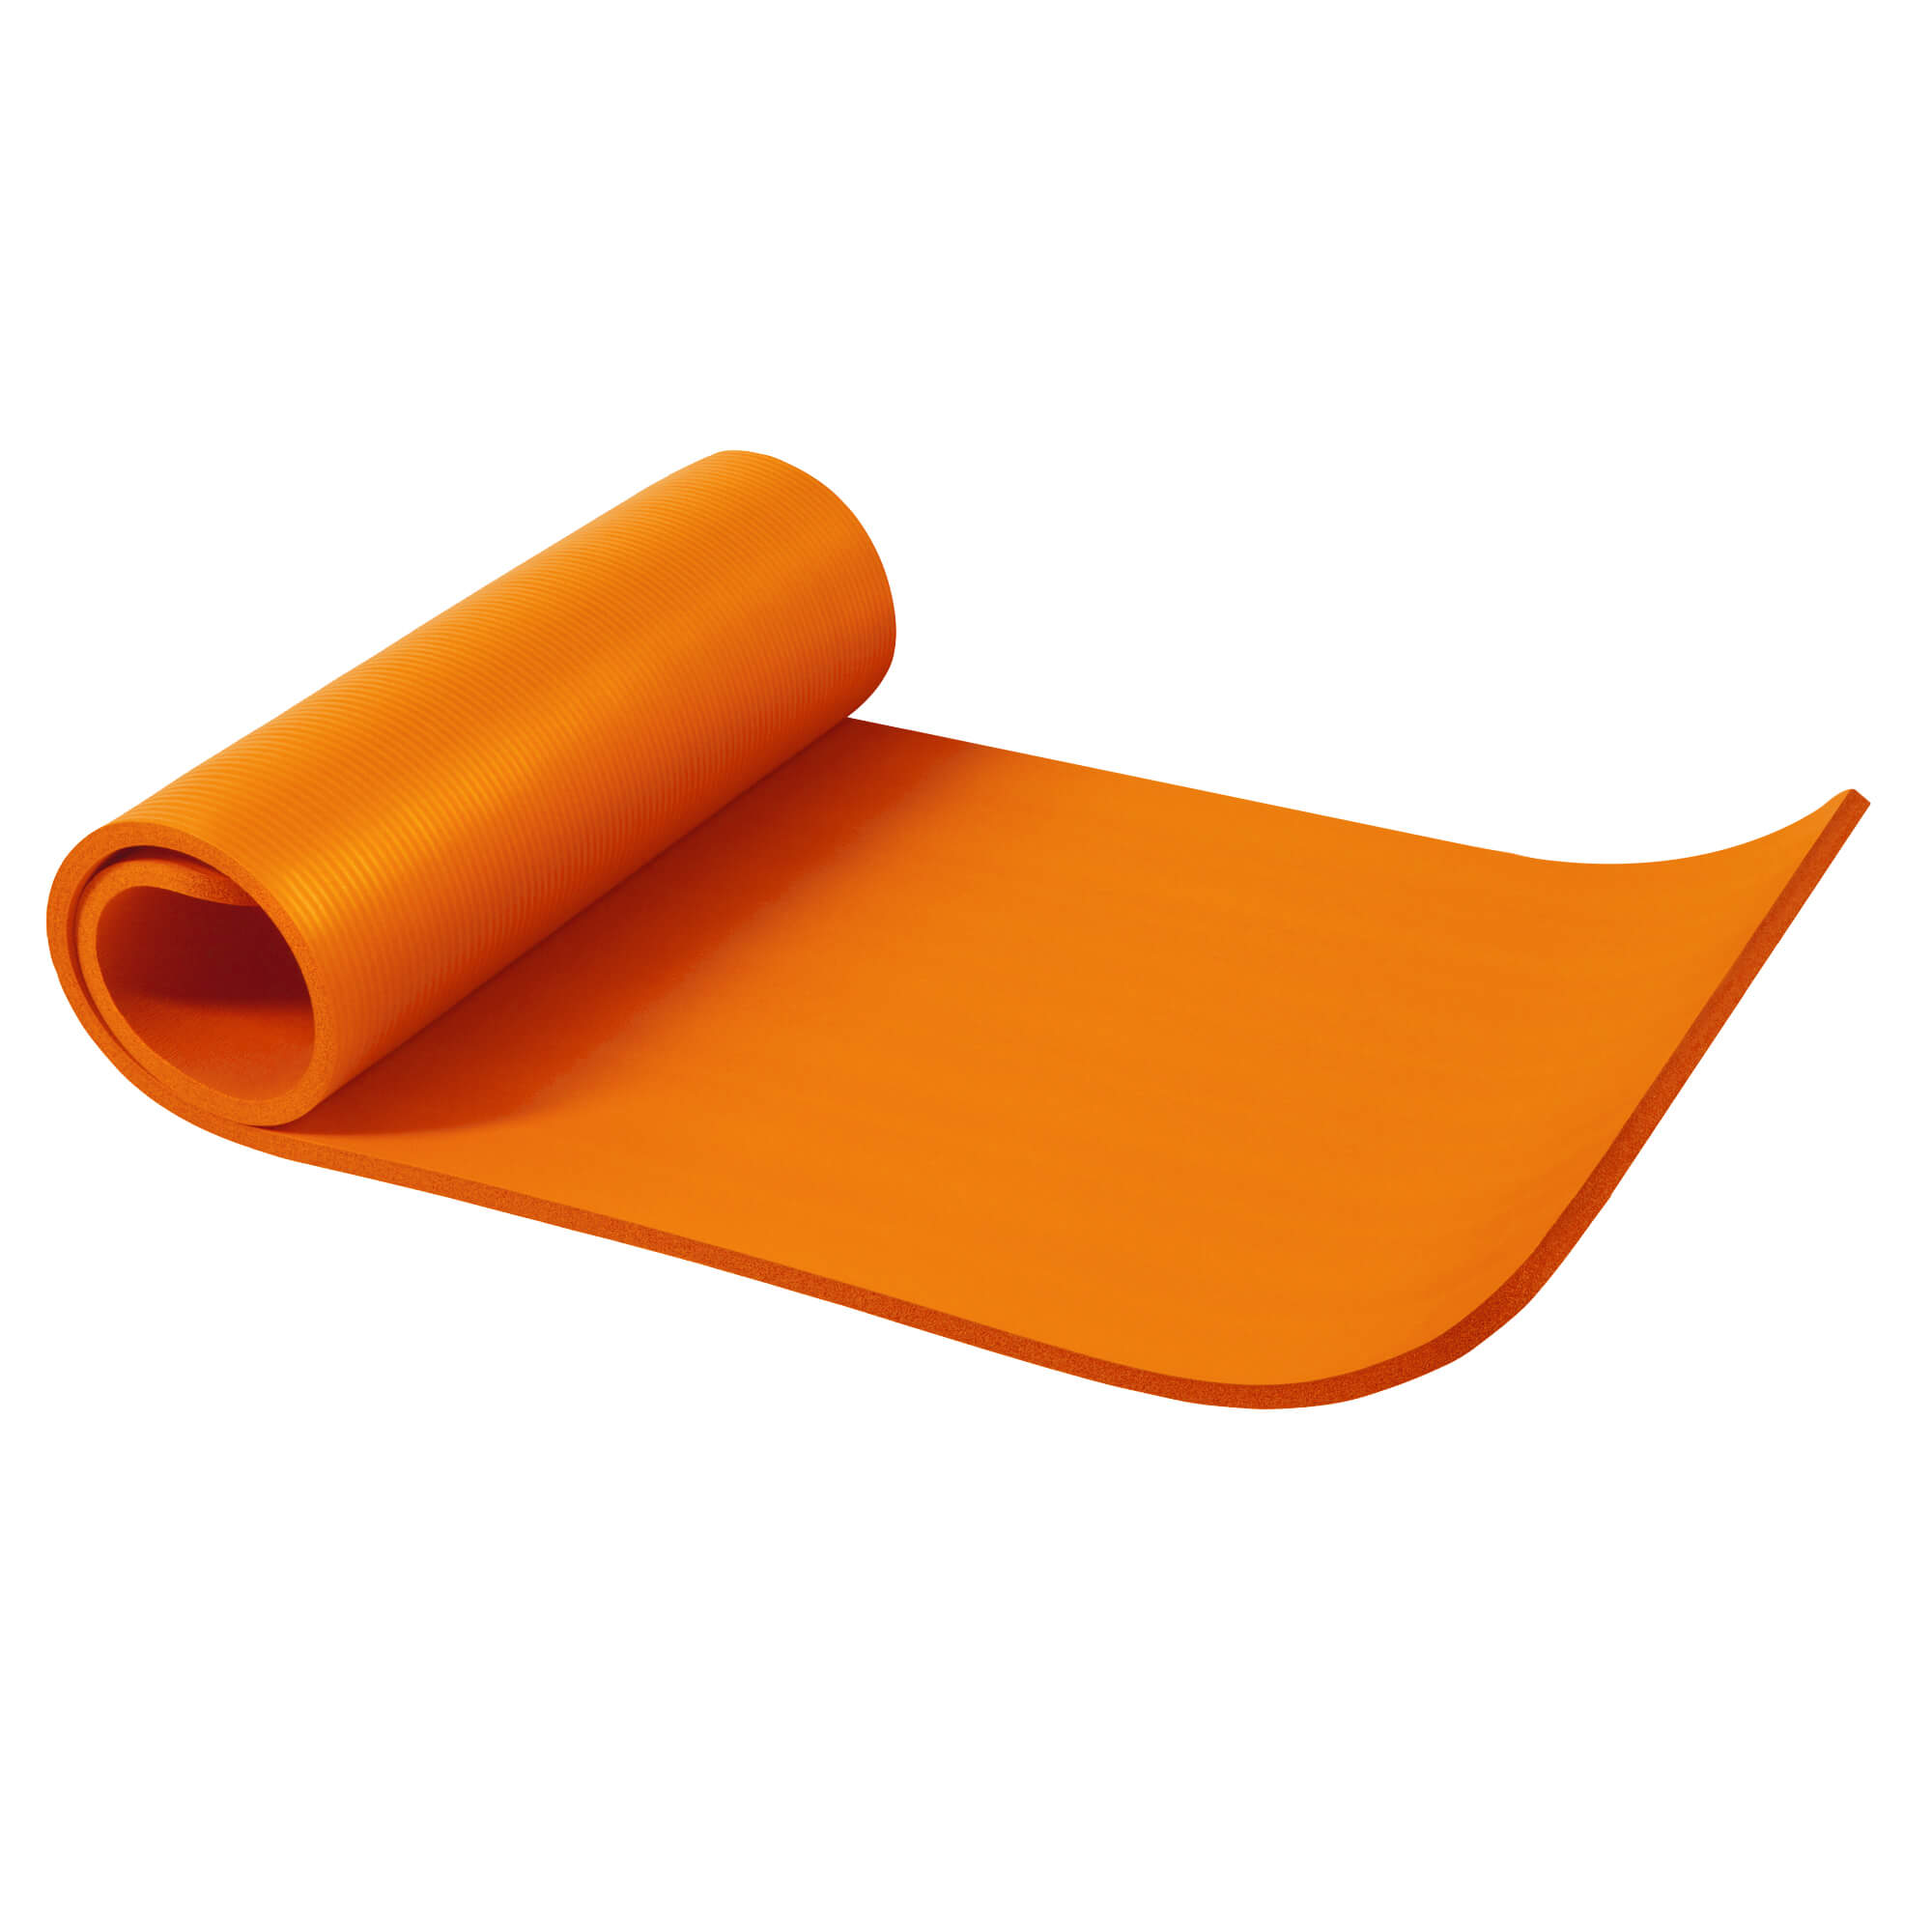 Yogamatte Orange 190 x 60 x 1,5 cm